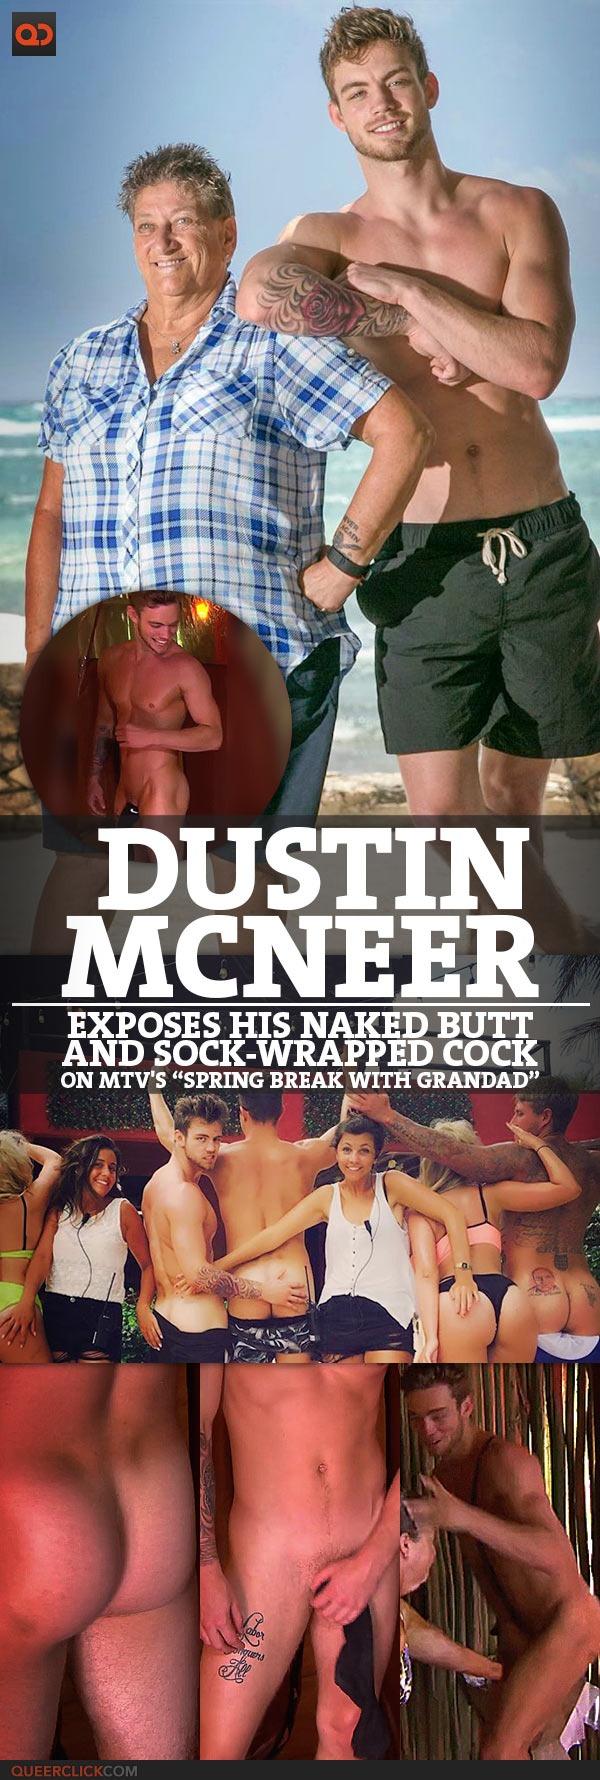 Dustin Mcneer Porn